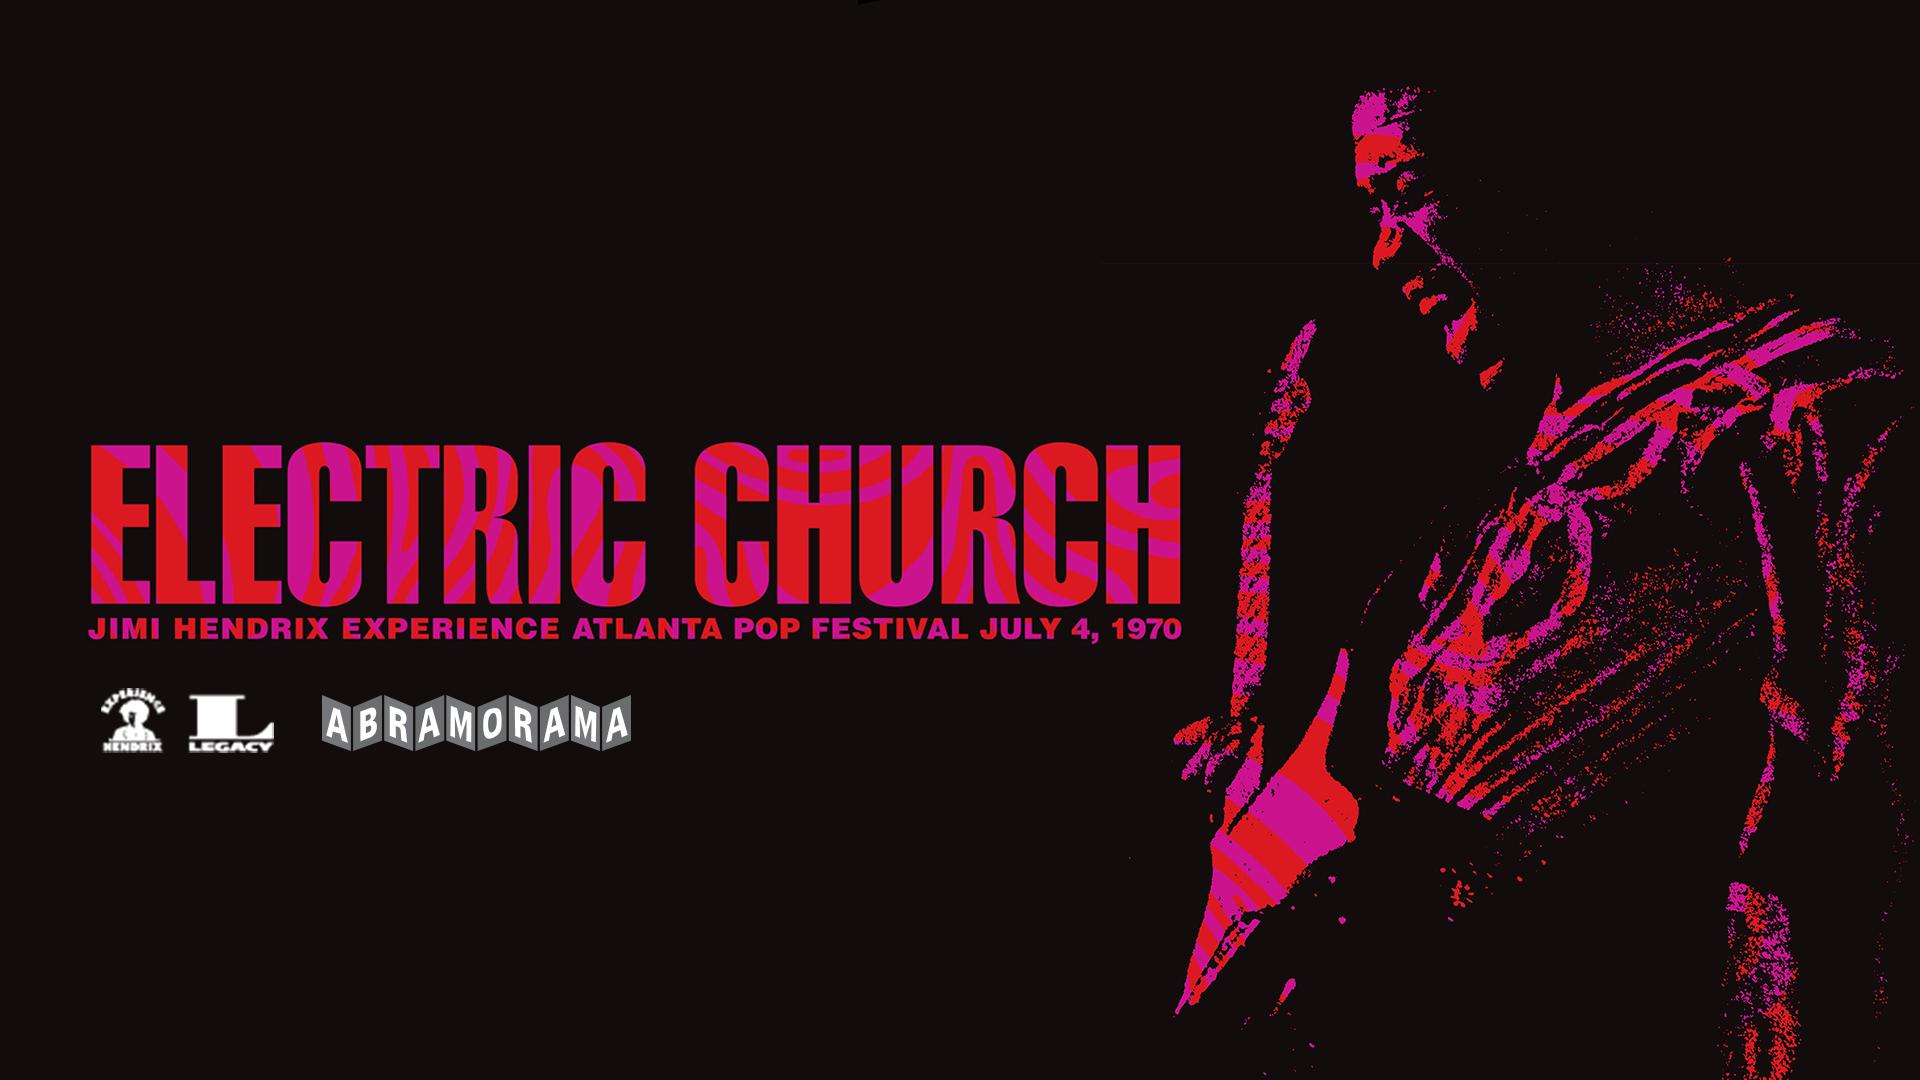 Electric Church: Jimi Hendrix Experience Atlanta Pop Festival 1970 in Springfield, MO